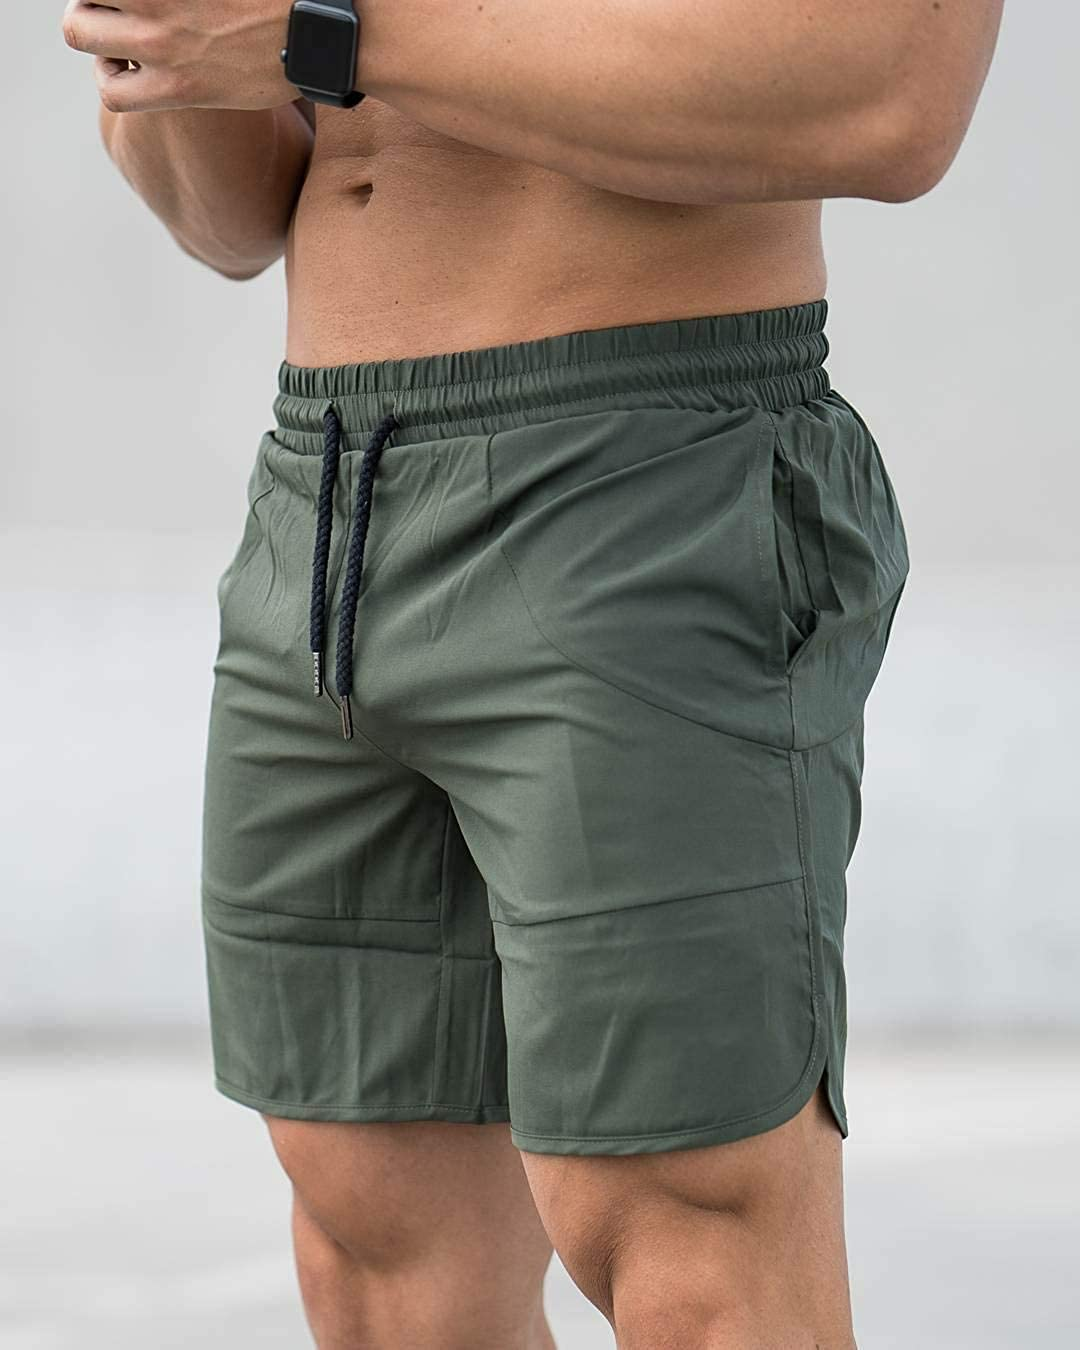 Männer Kurze Hose Laufen Kurze Hose Sommer Fest Dünn Übergrößen Sportlich